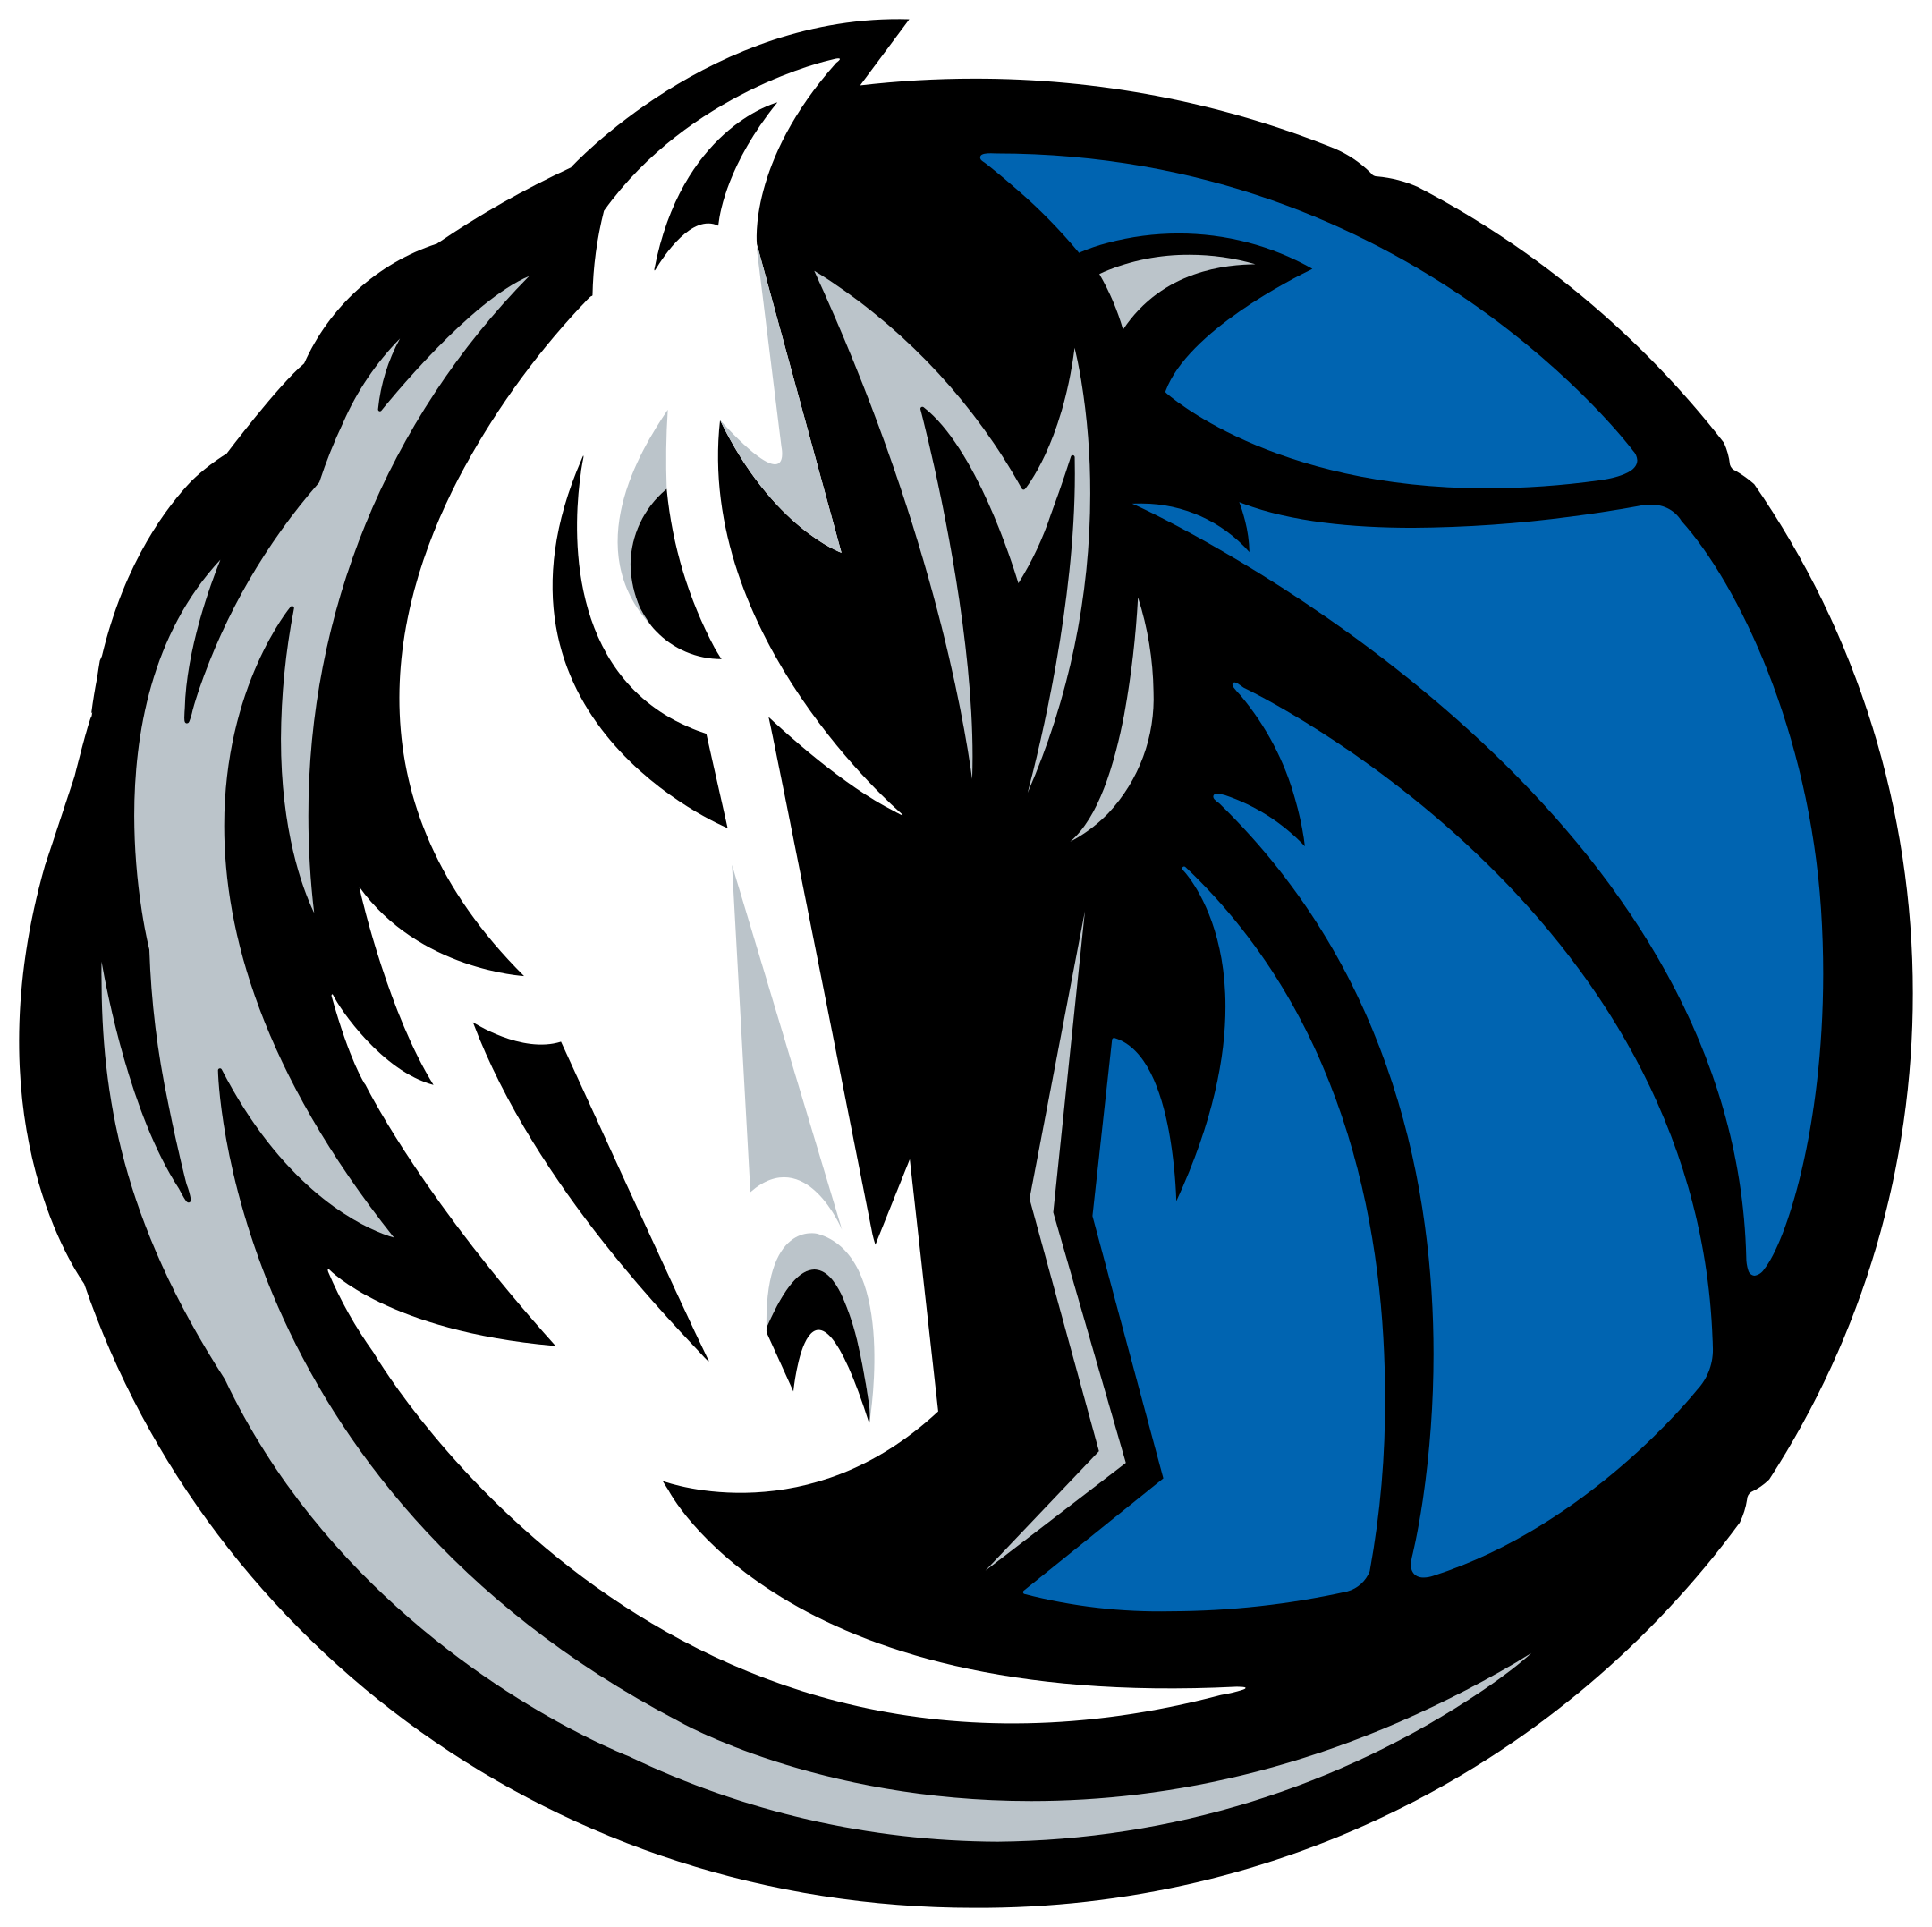 dallas mavericks logo 1 - Dallas Mavericks Logo